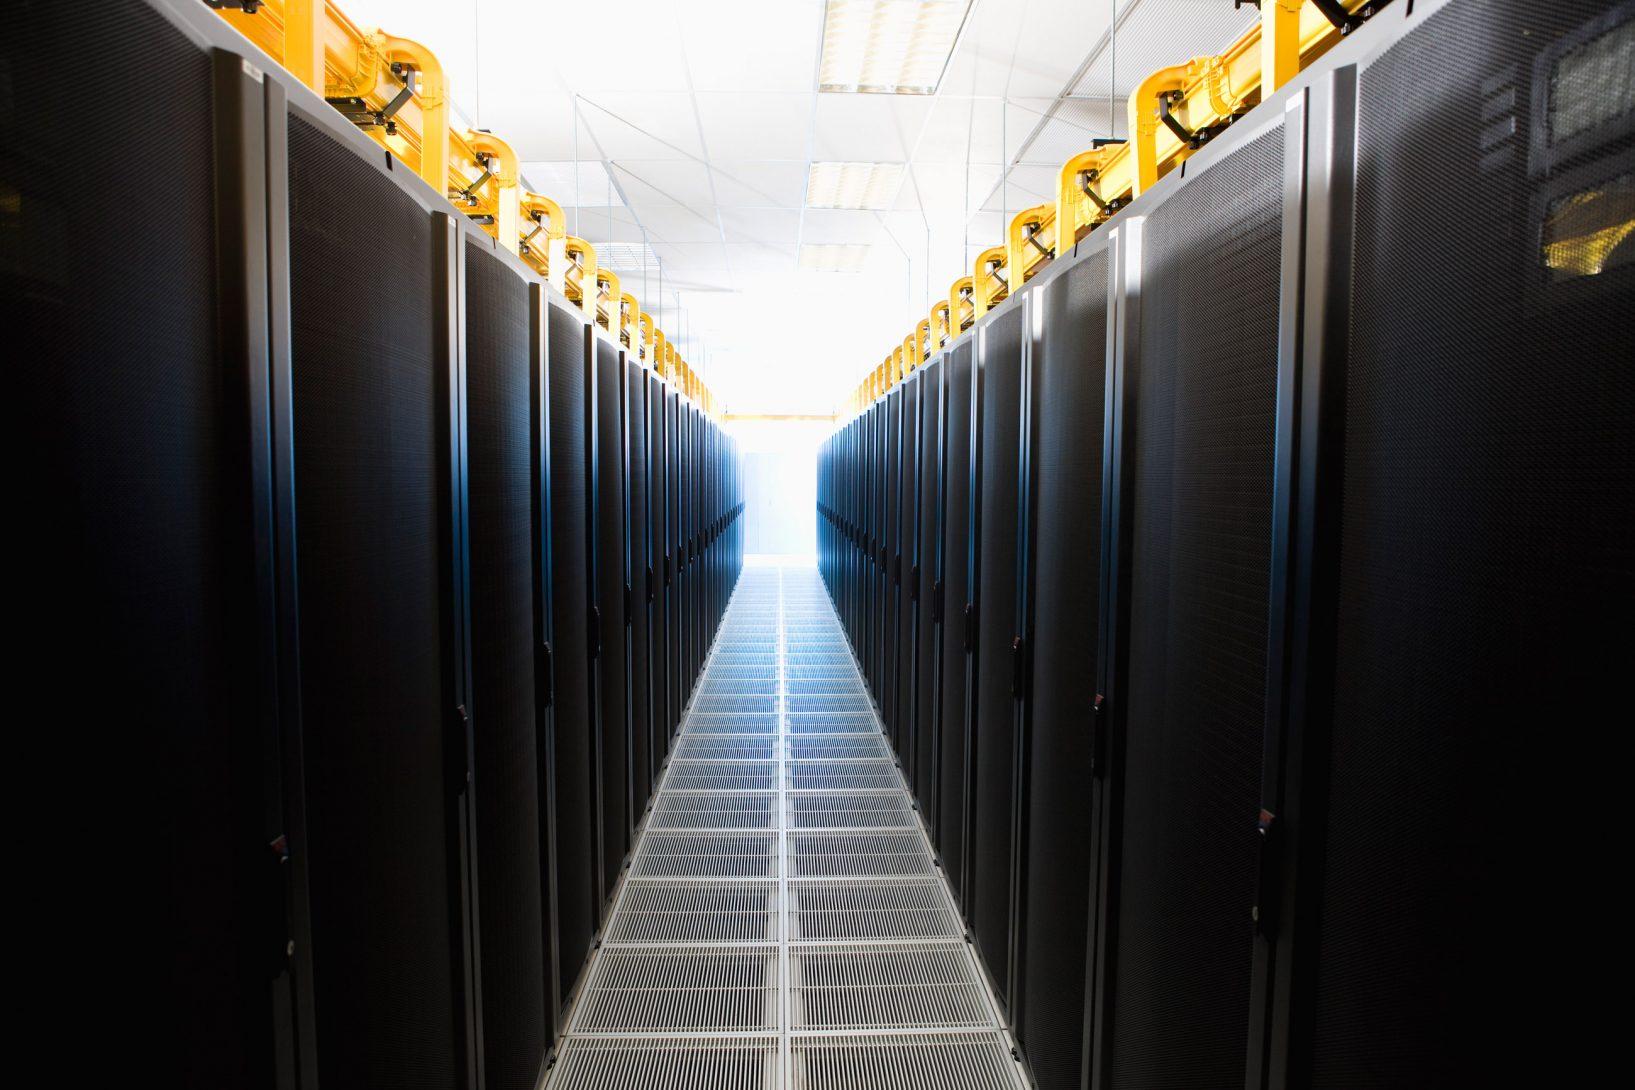 1534579778sap data center 1 1635x1090